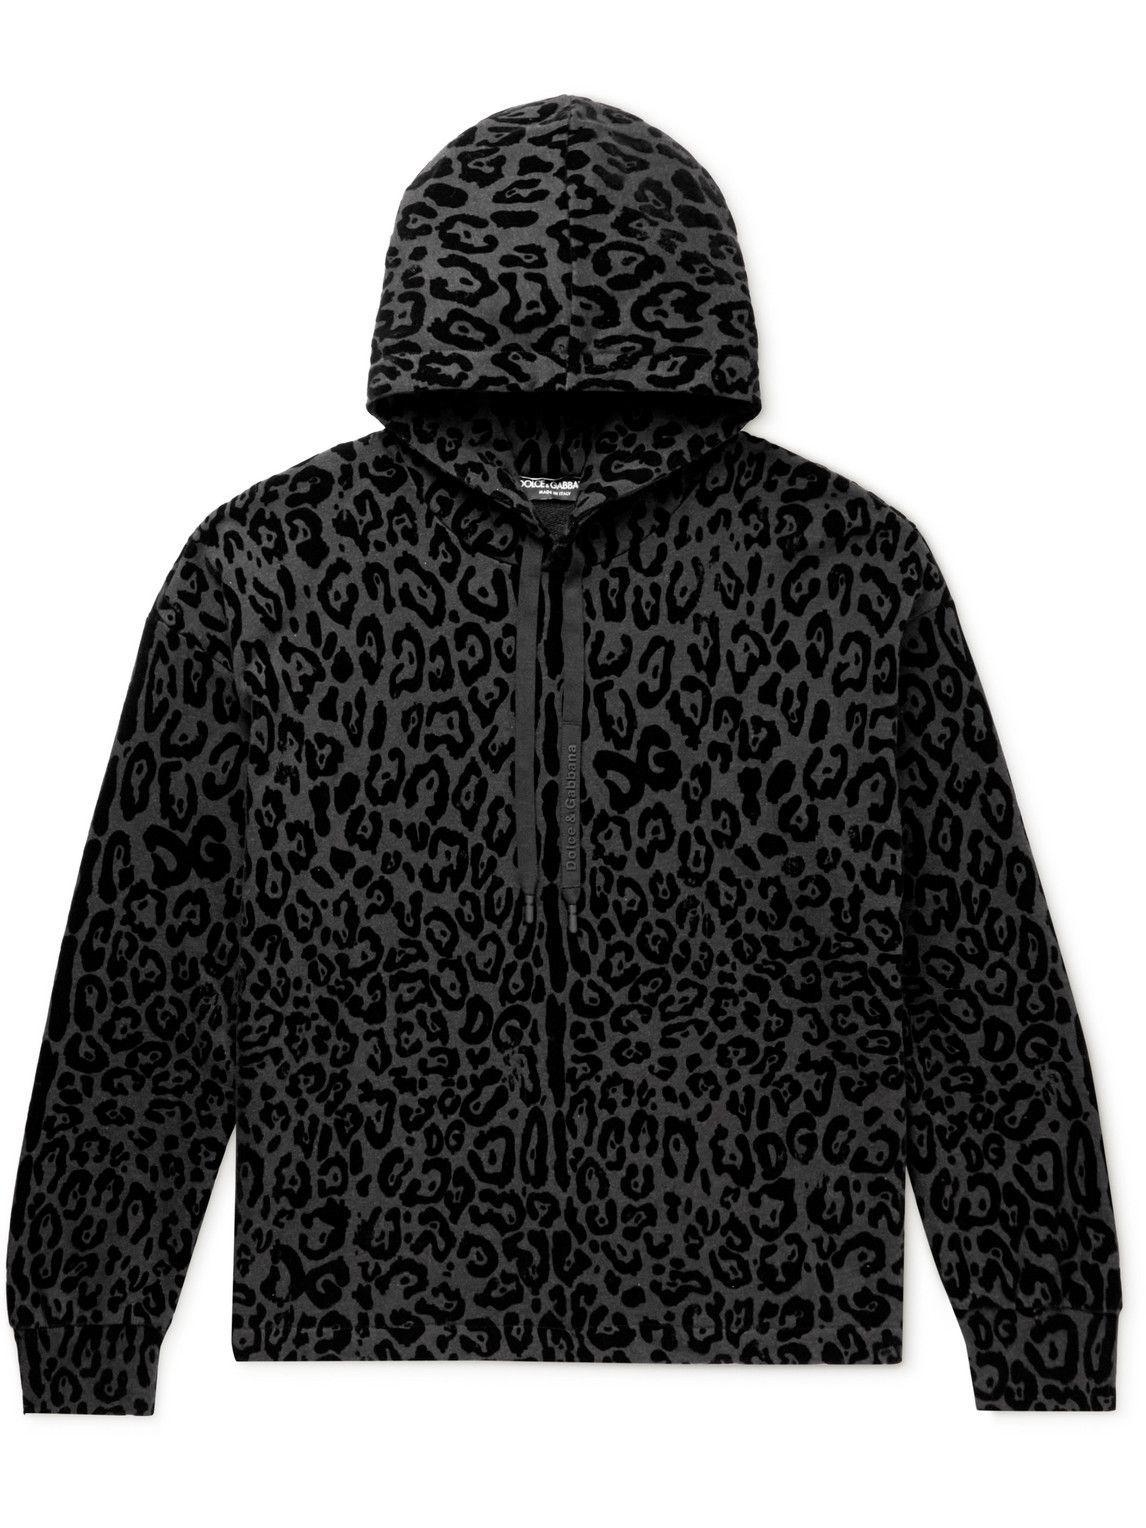 Photo: Dolce & Gabbana - Leopard-Flocked Cotton-Jersey Hoodie - Black